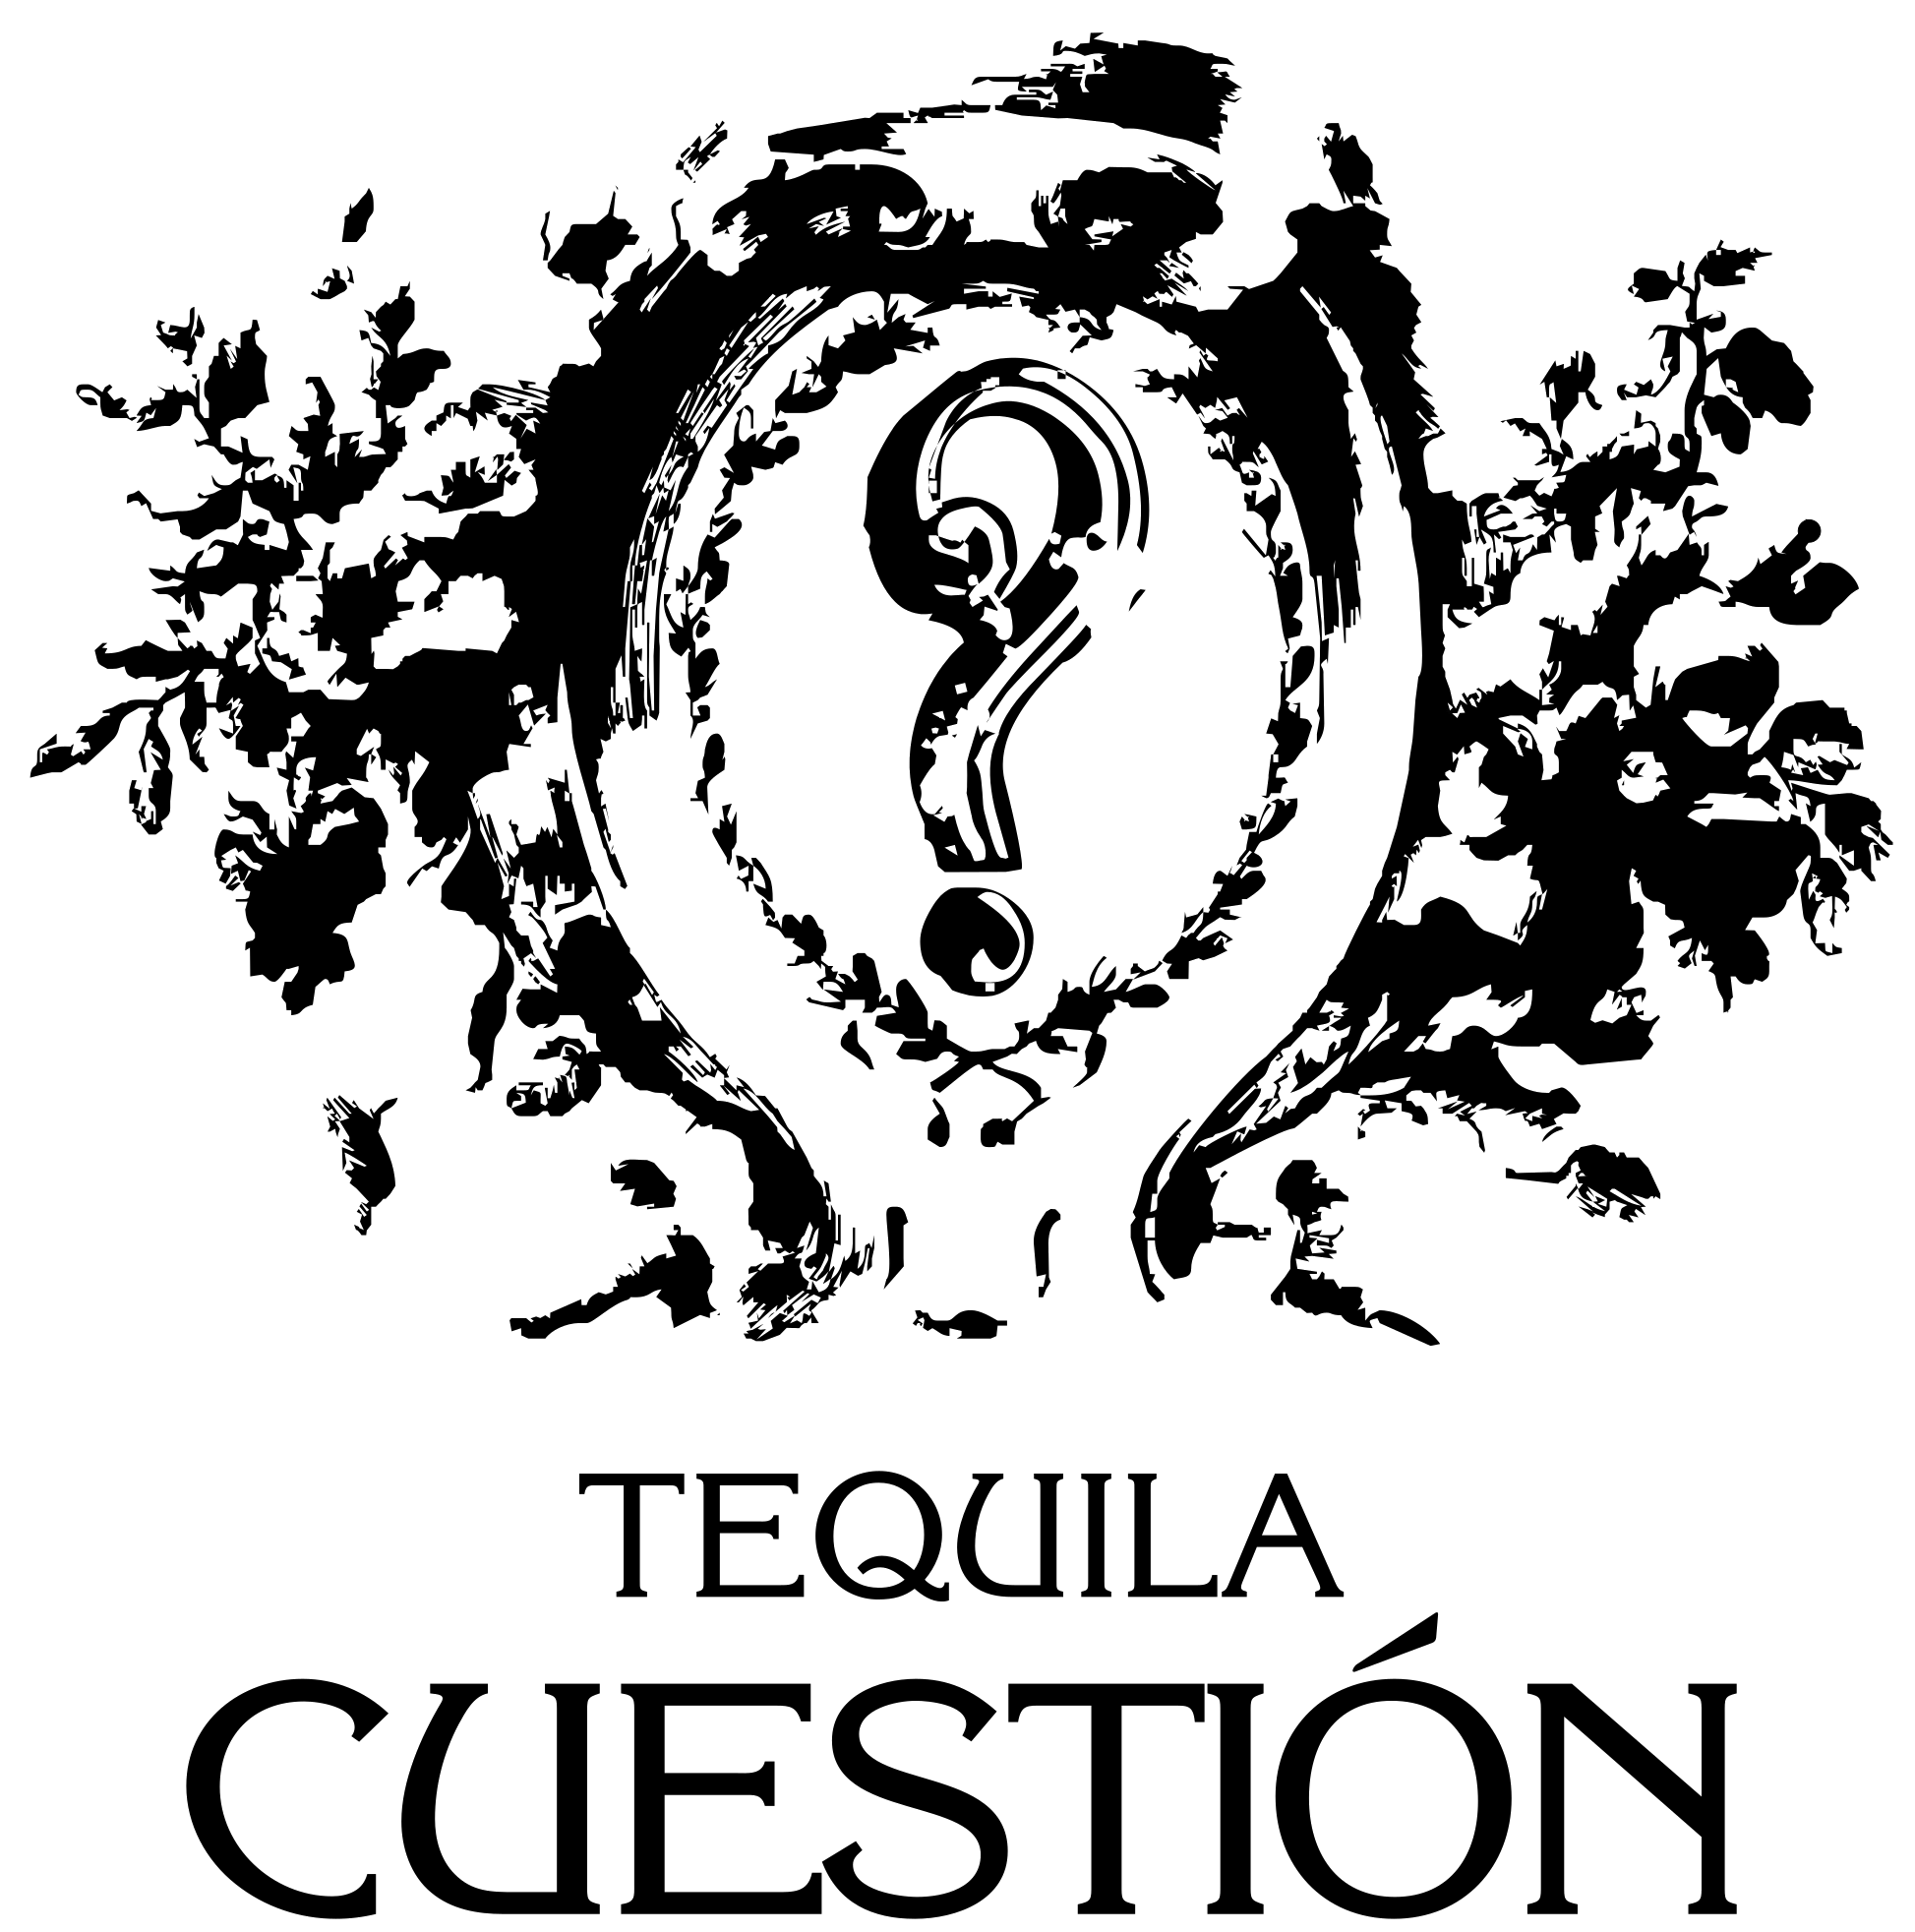 Cuestion